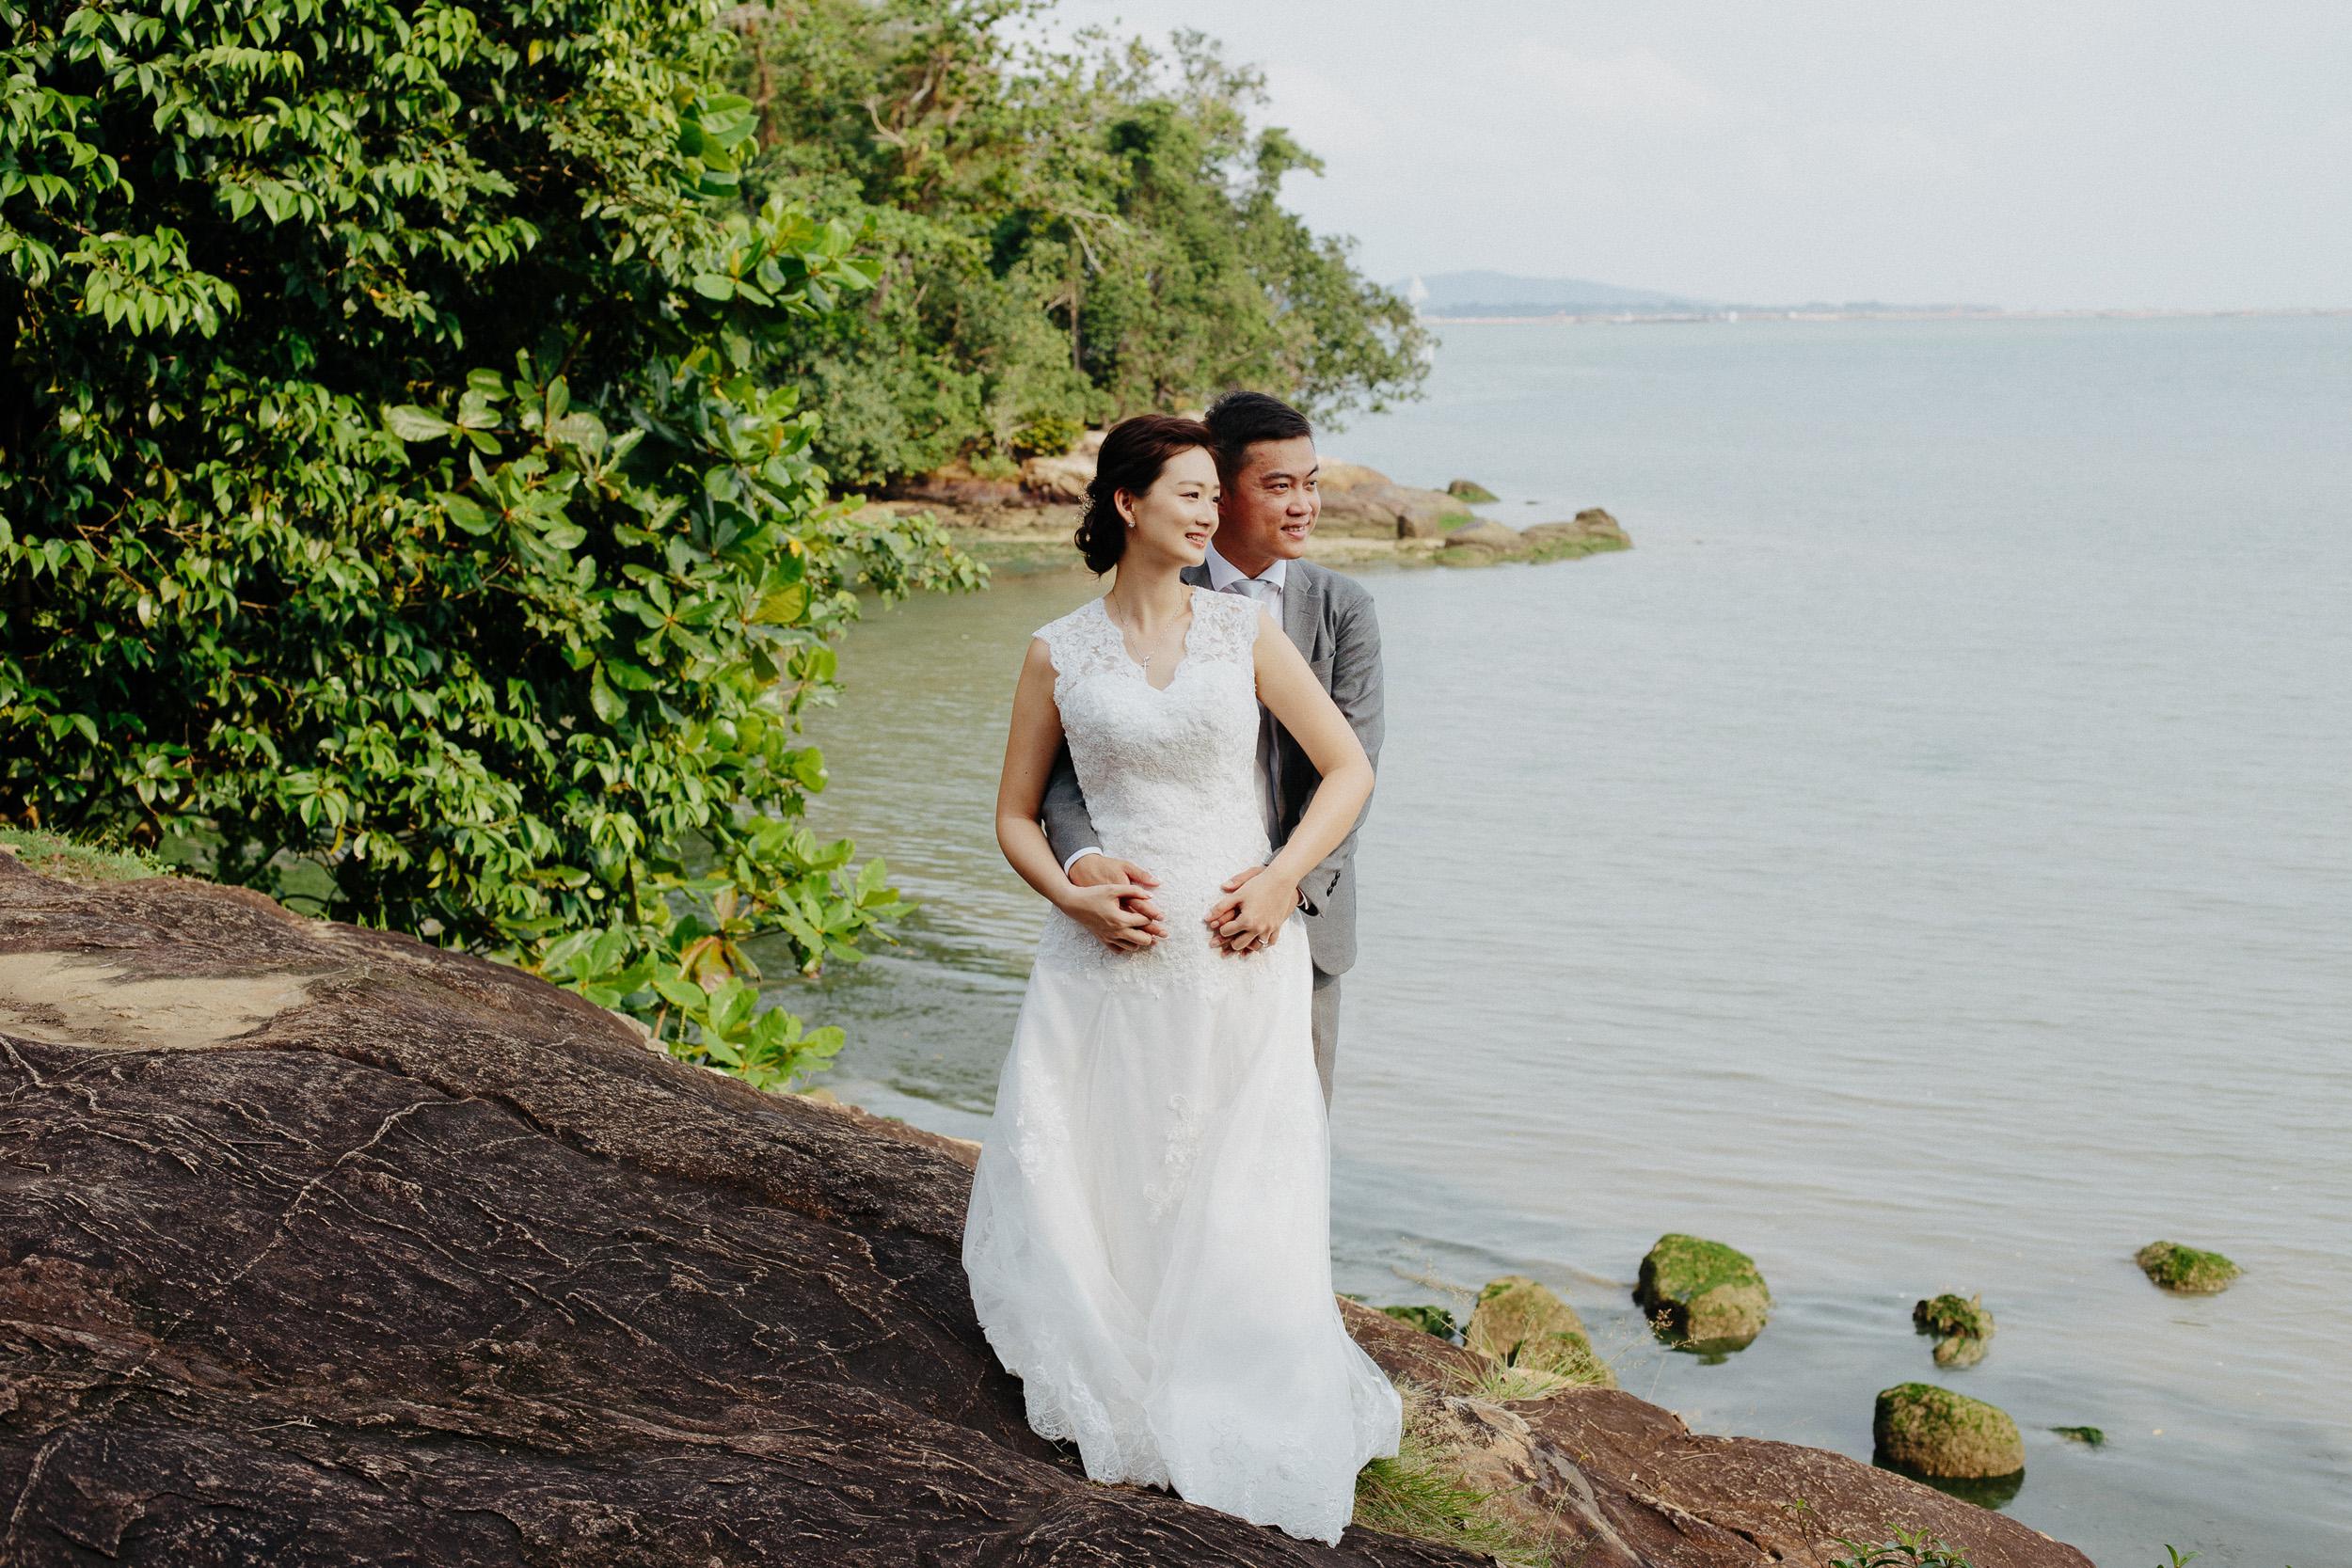 singapore-wedding-photographer-photography-wmt2017-126.jpg